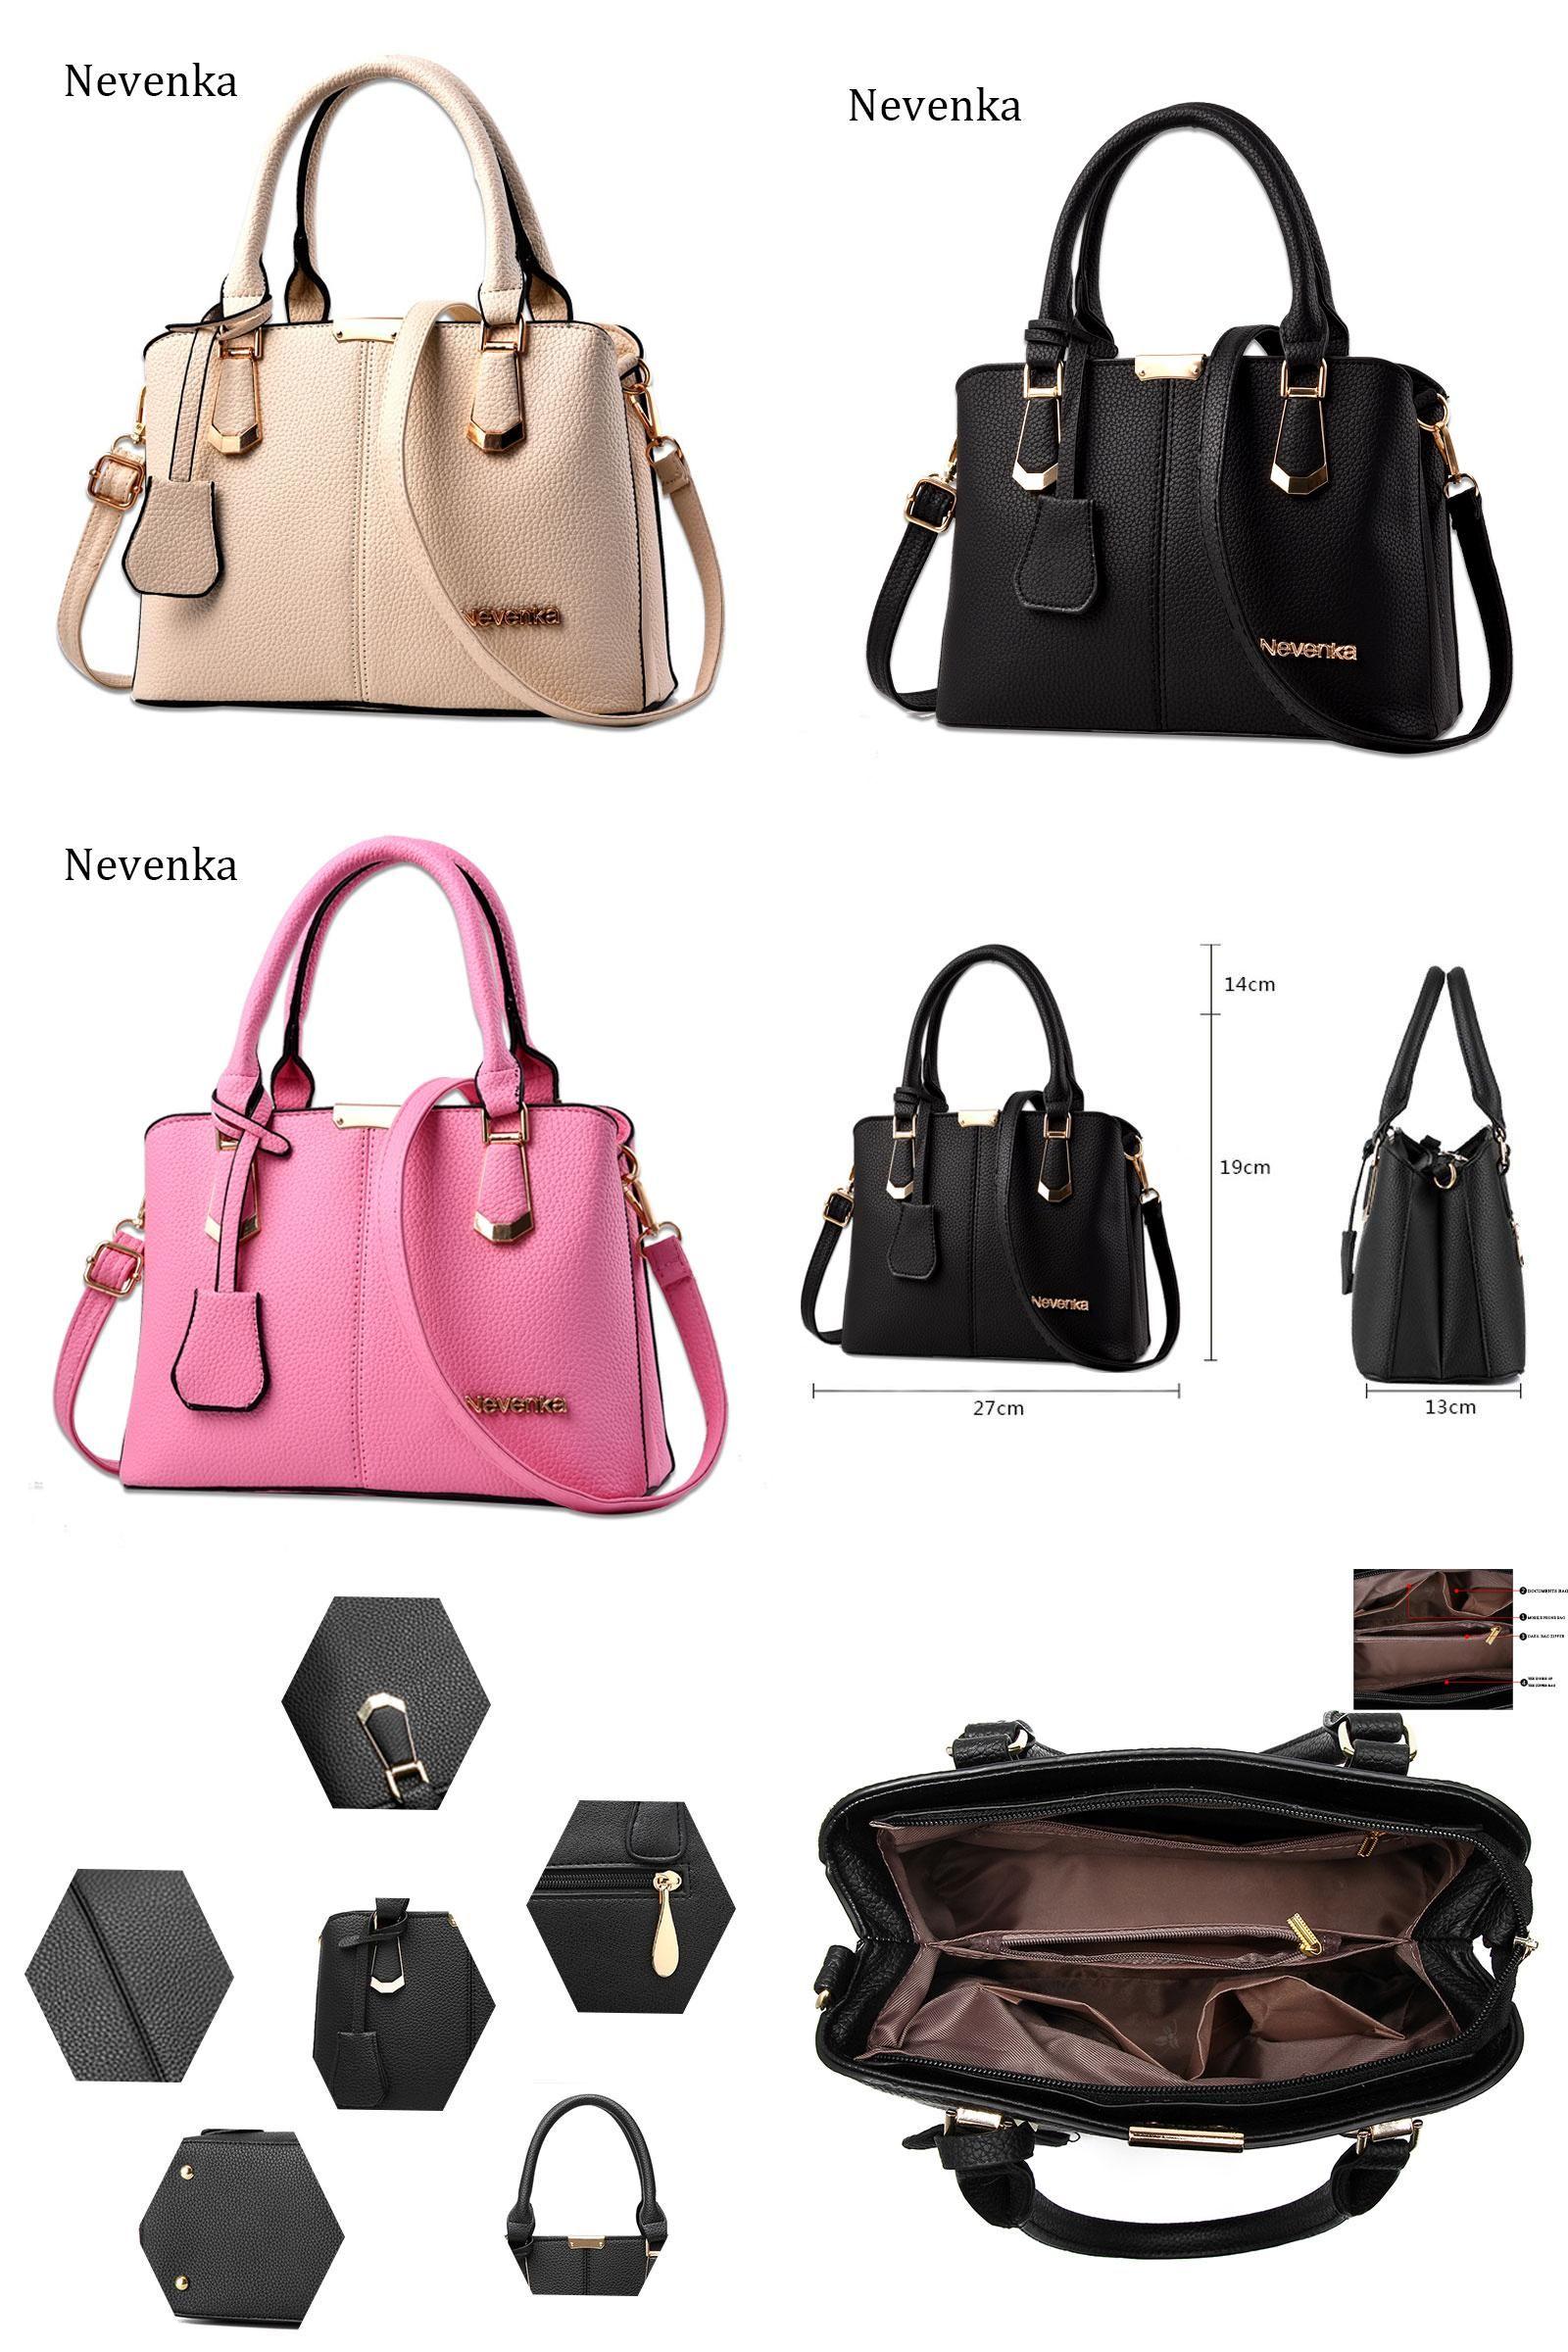 90d42a1acffb [Visit to Buy] Nevenka Women Bag Lady Handbag OL Style Shoulder Bags Casual  Zipper Messenger Bags PU Leather Bag Brand Name Tote Satchel Sac  #Advertisement